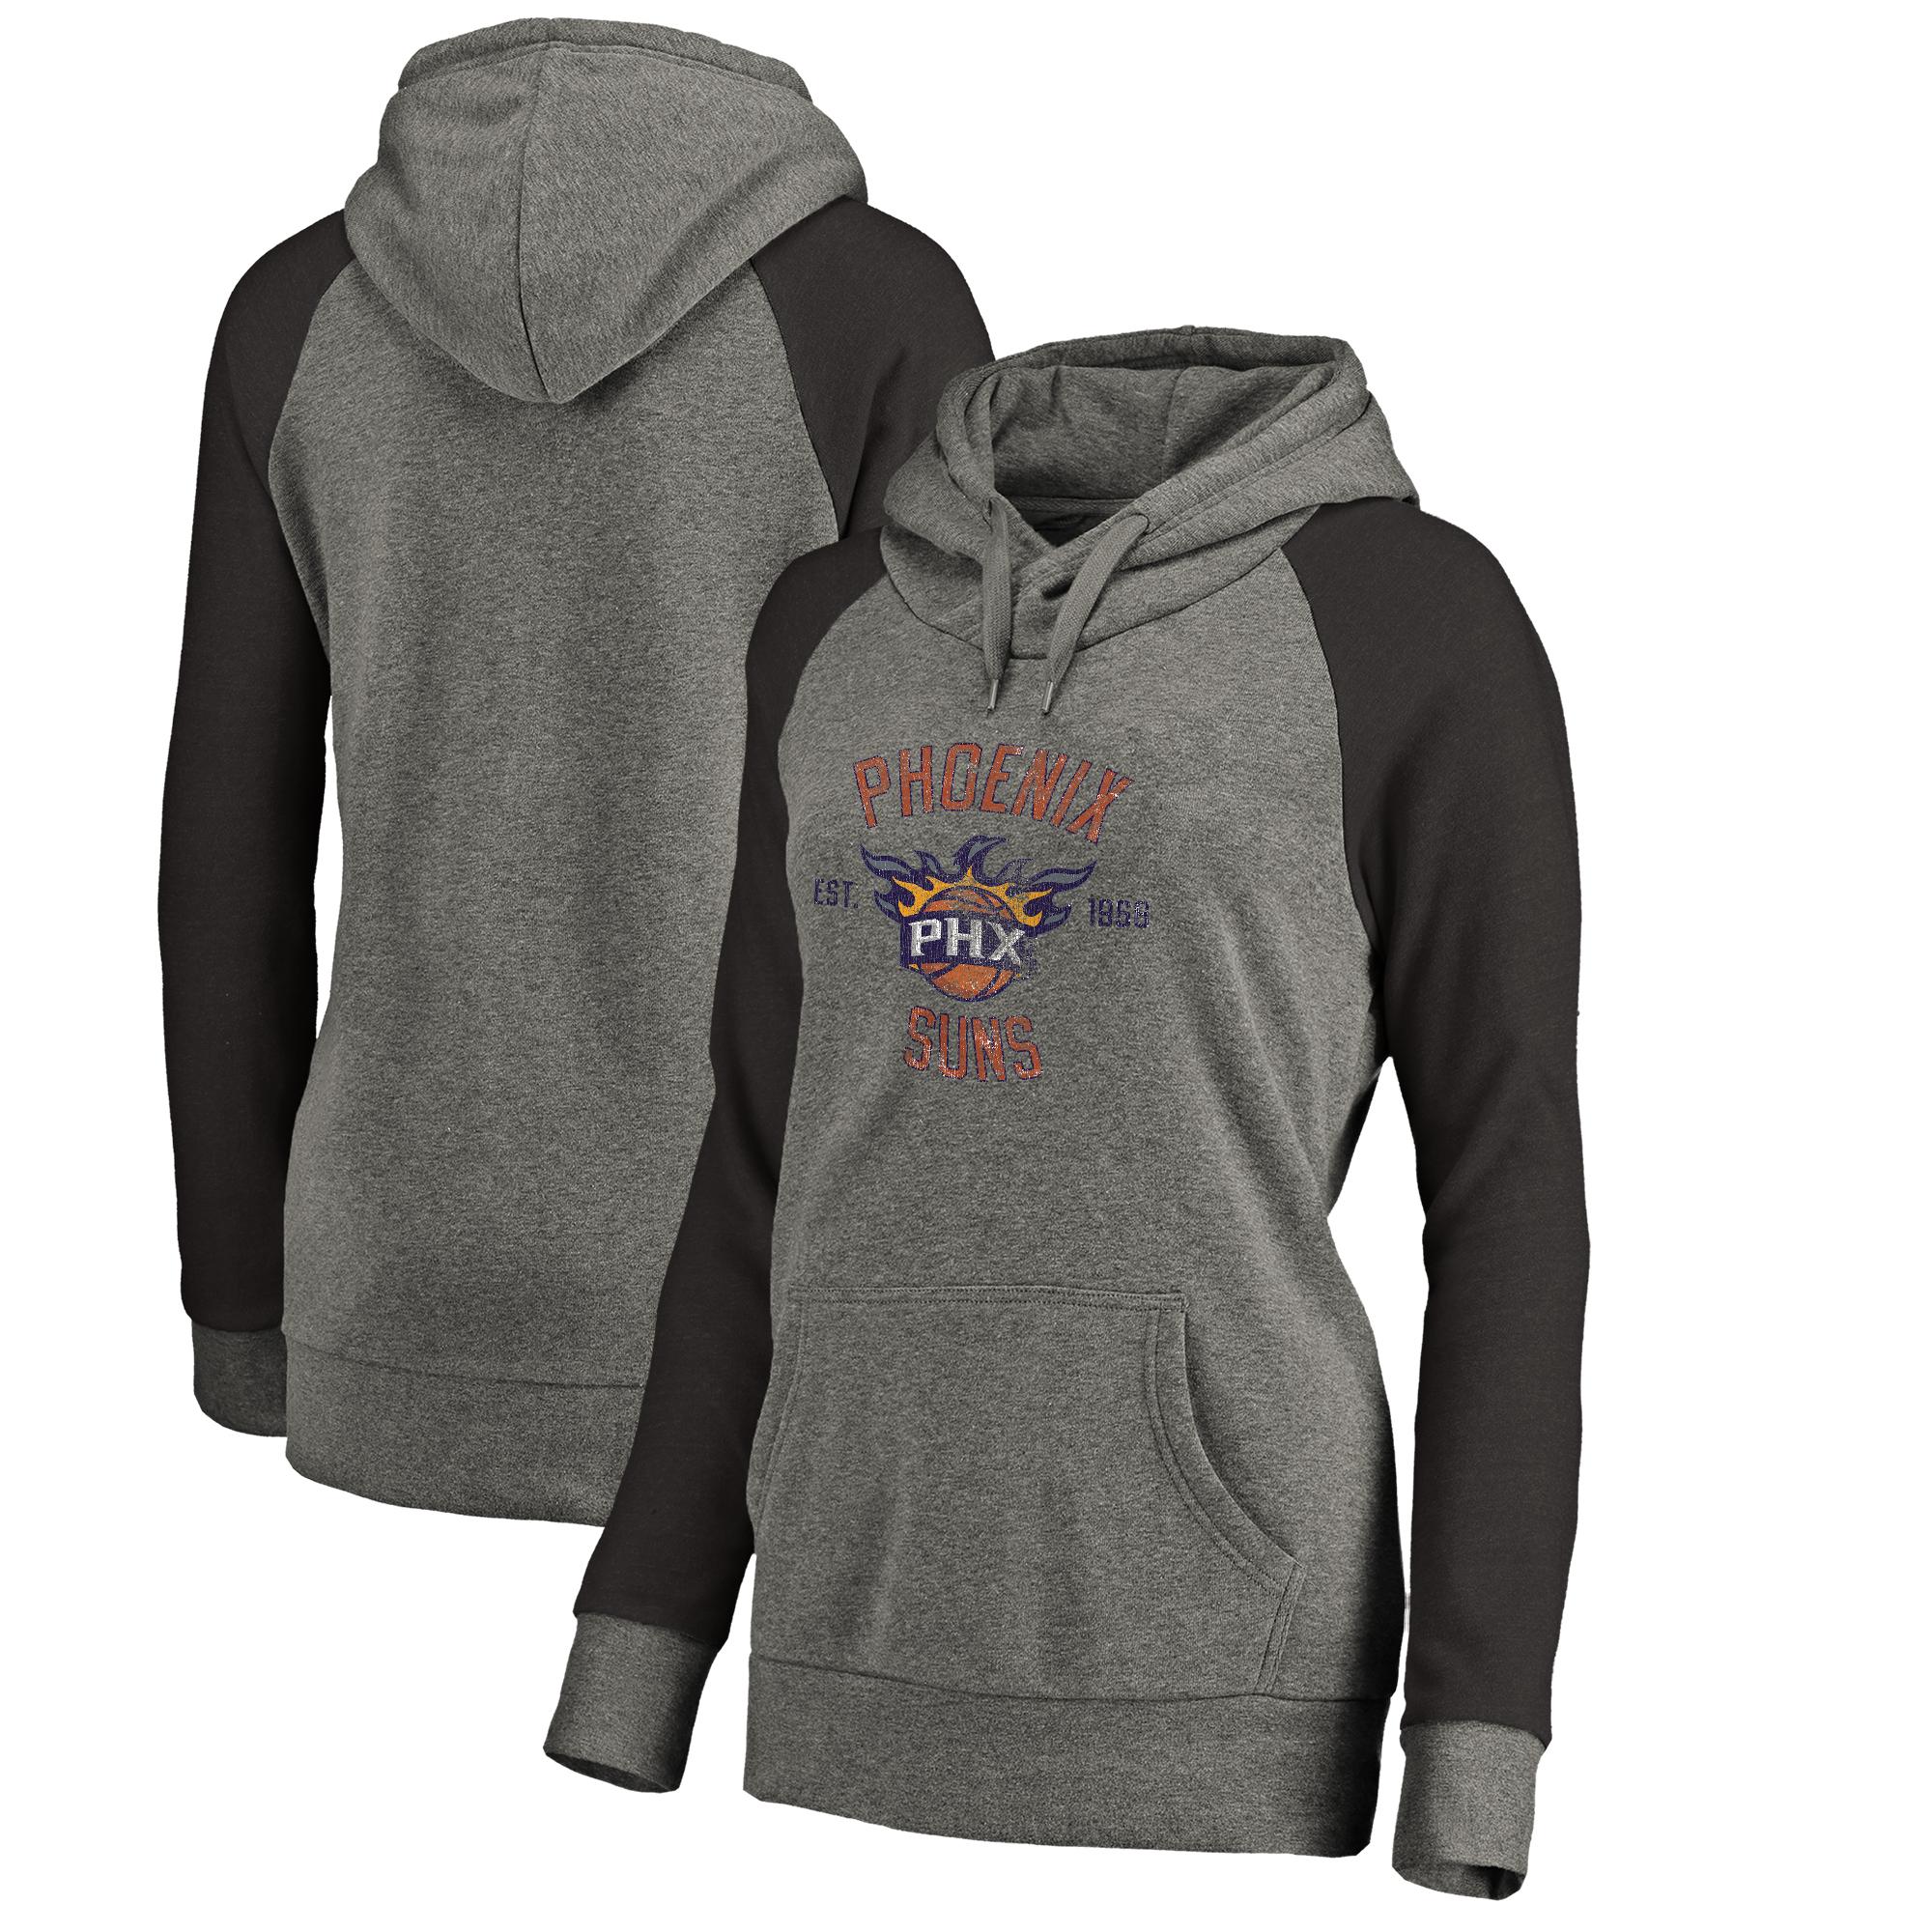 Phoenix Suns Fanatics Branded Women's Heritage Tri-Blend Raglan Plus Size Pullover Hoodie - Heathered Gray